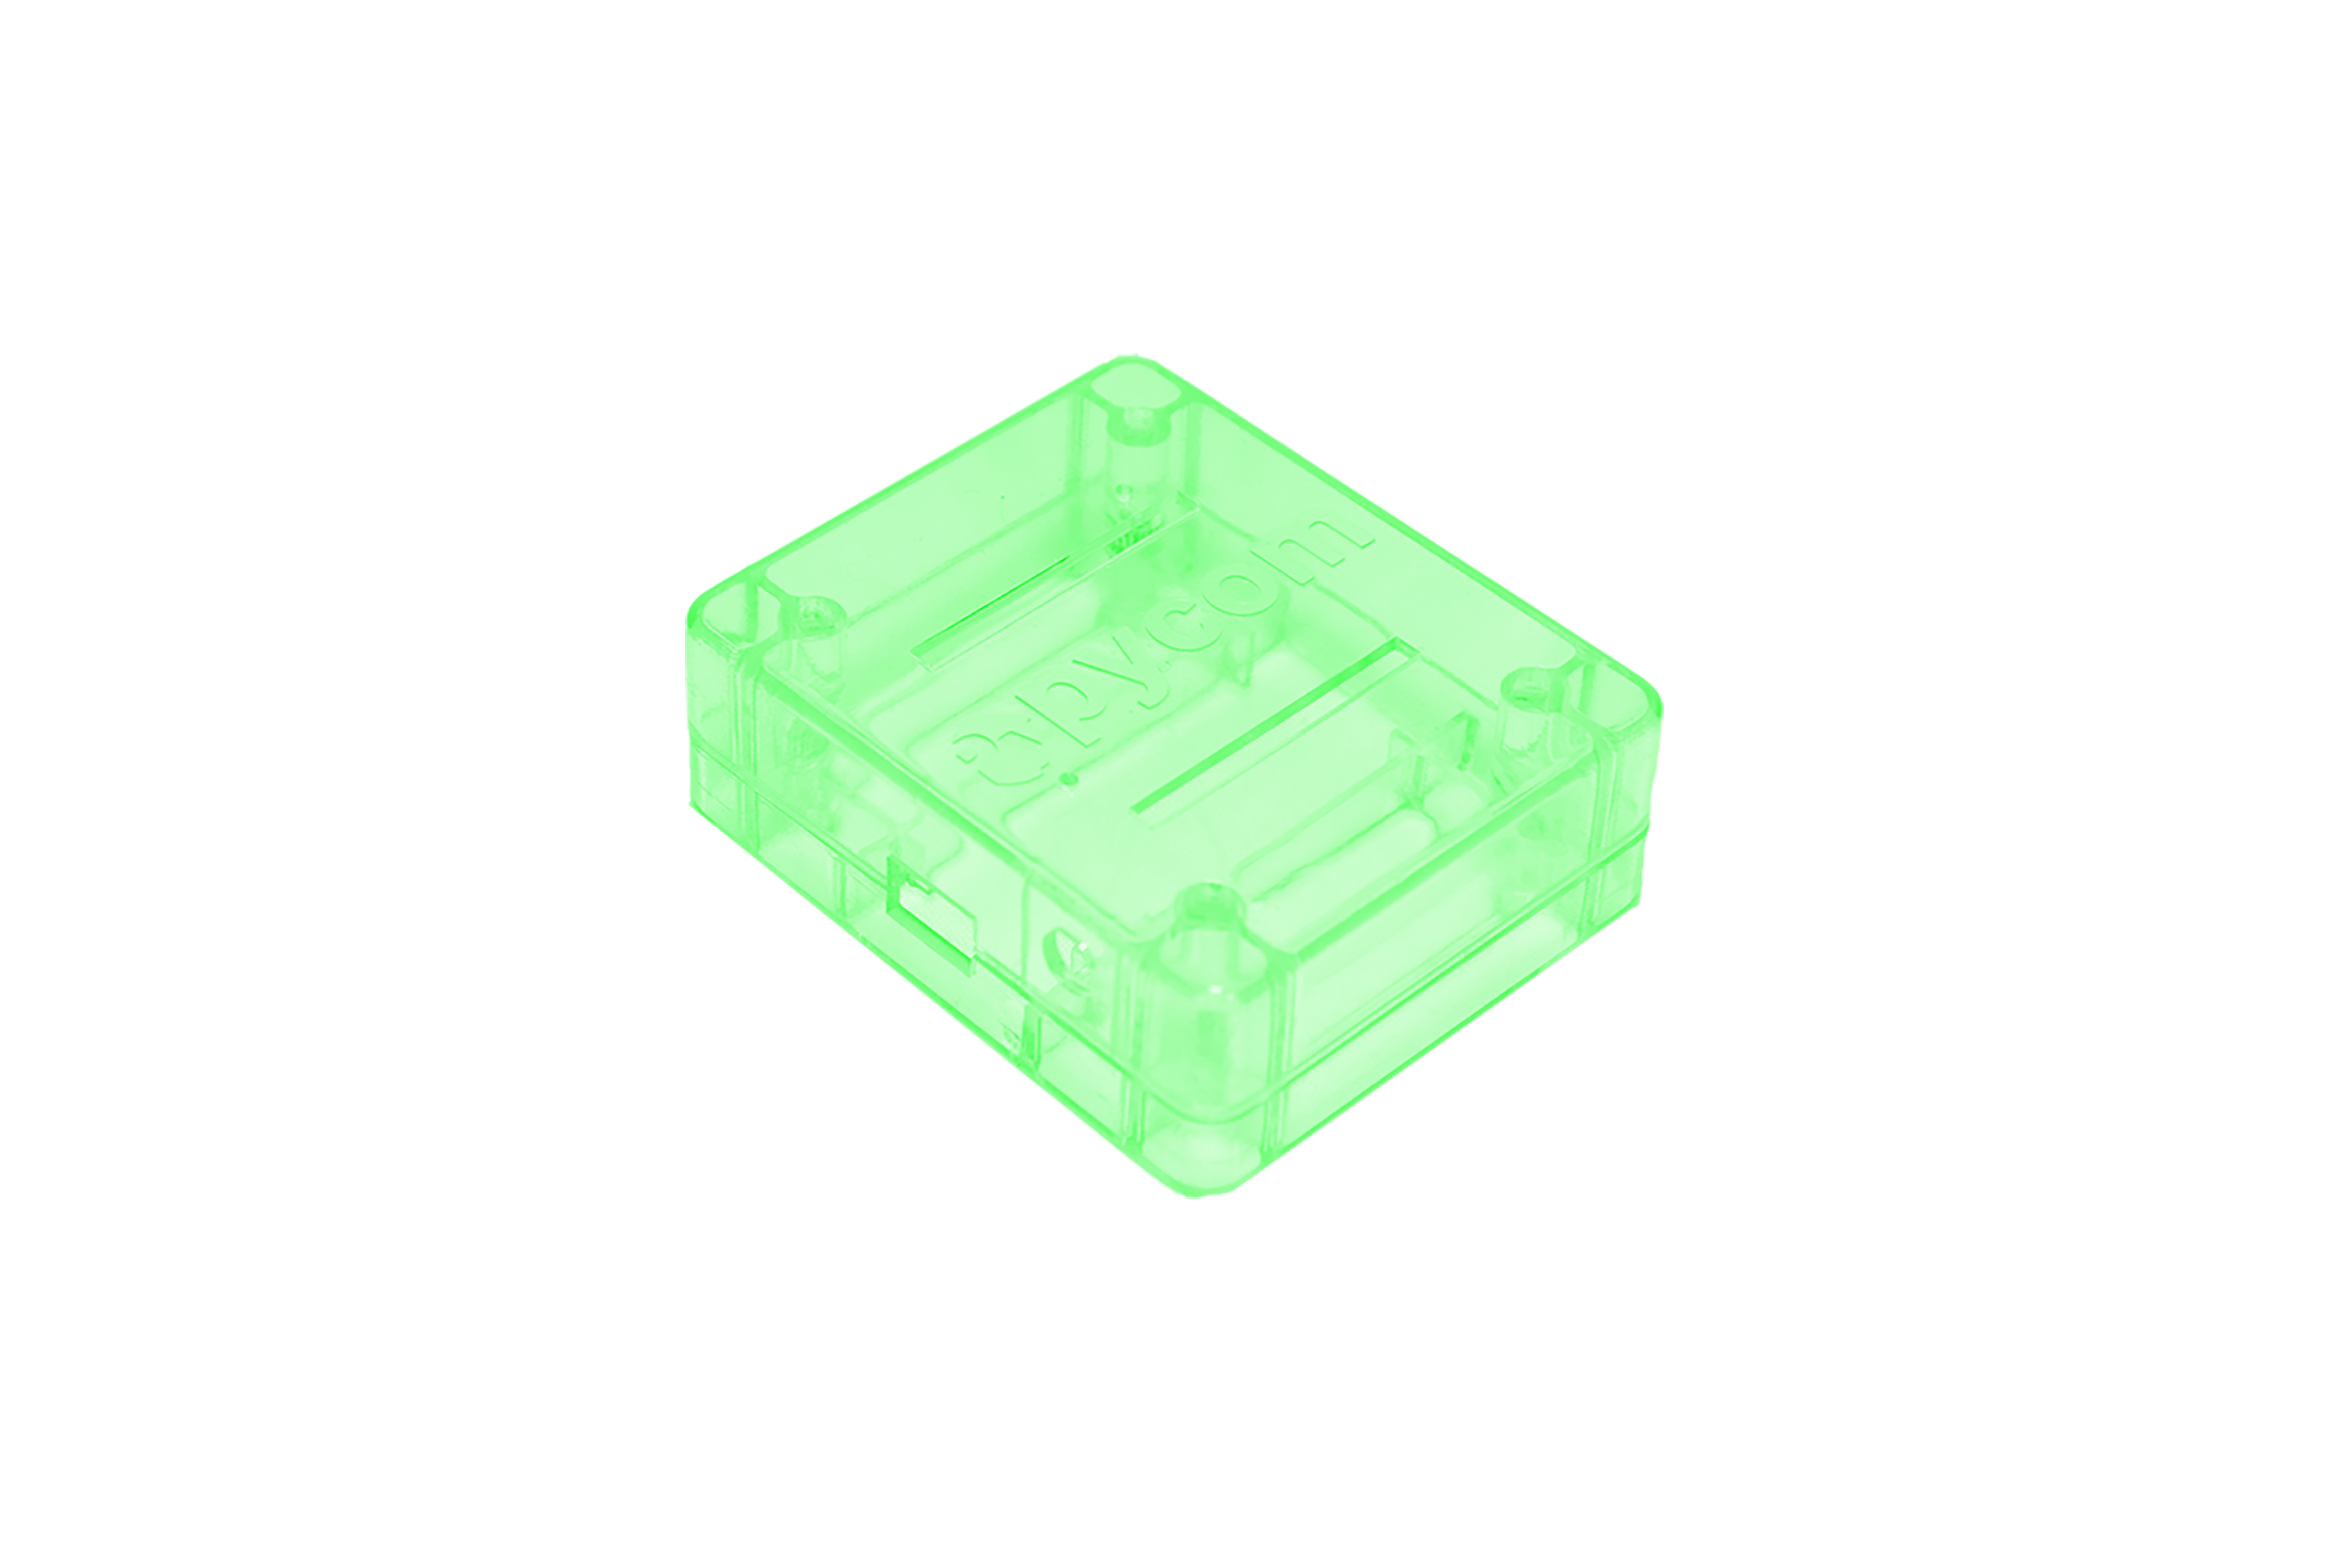 WIPY/LOPY/SIPY ボード用ケース - グリーン